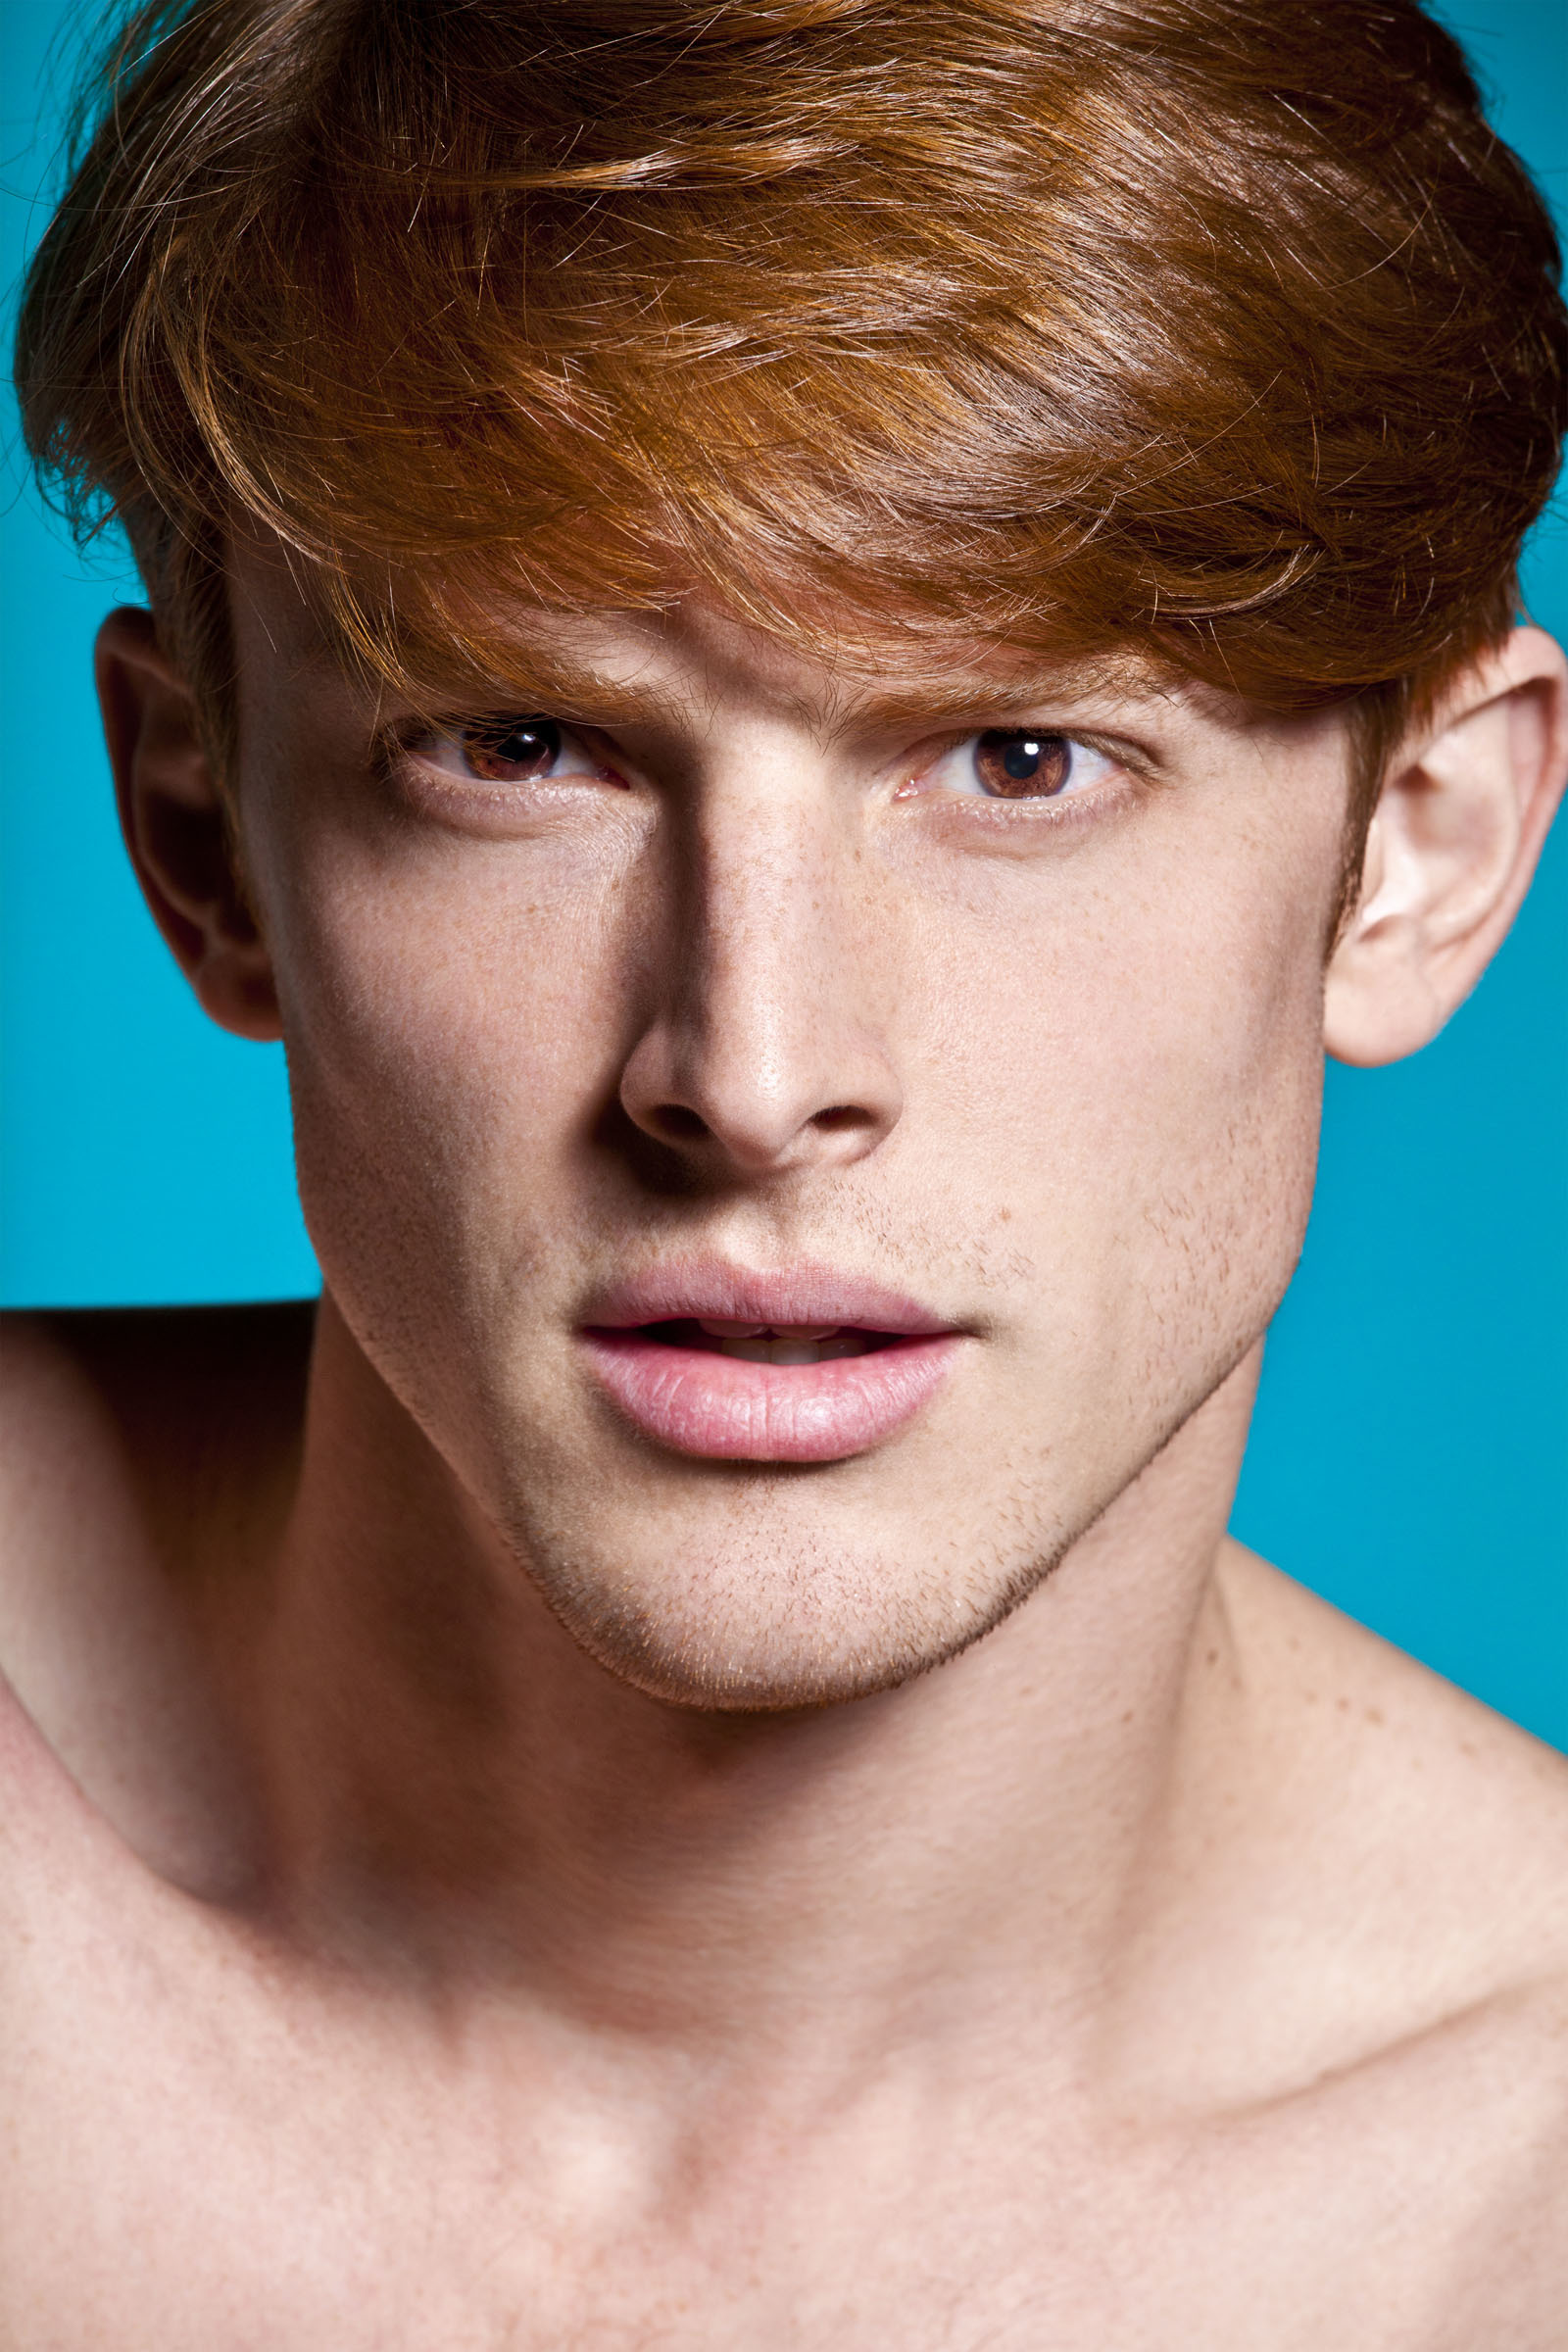 Hot redhead guy — img 3